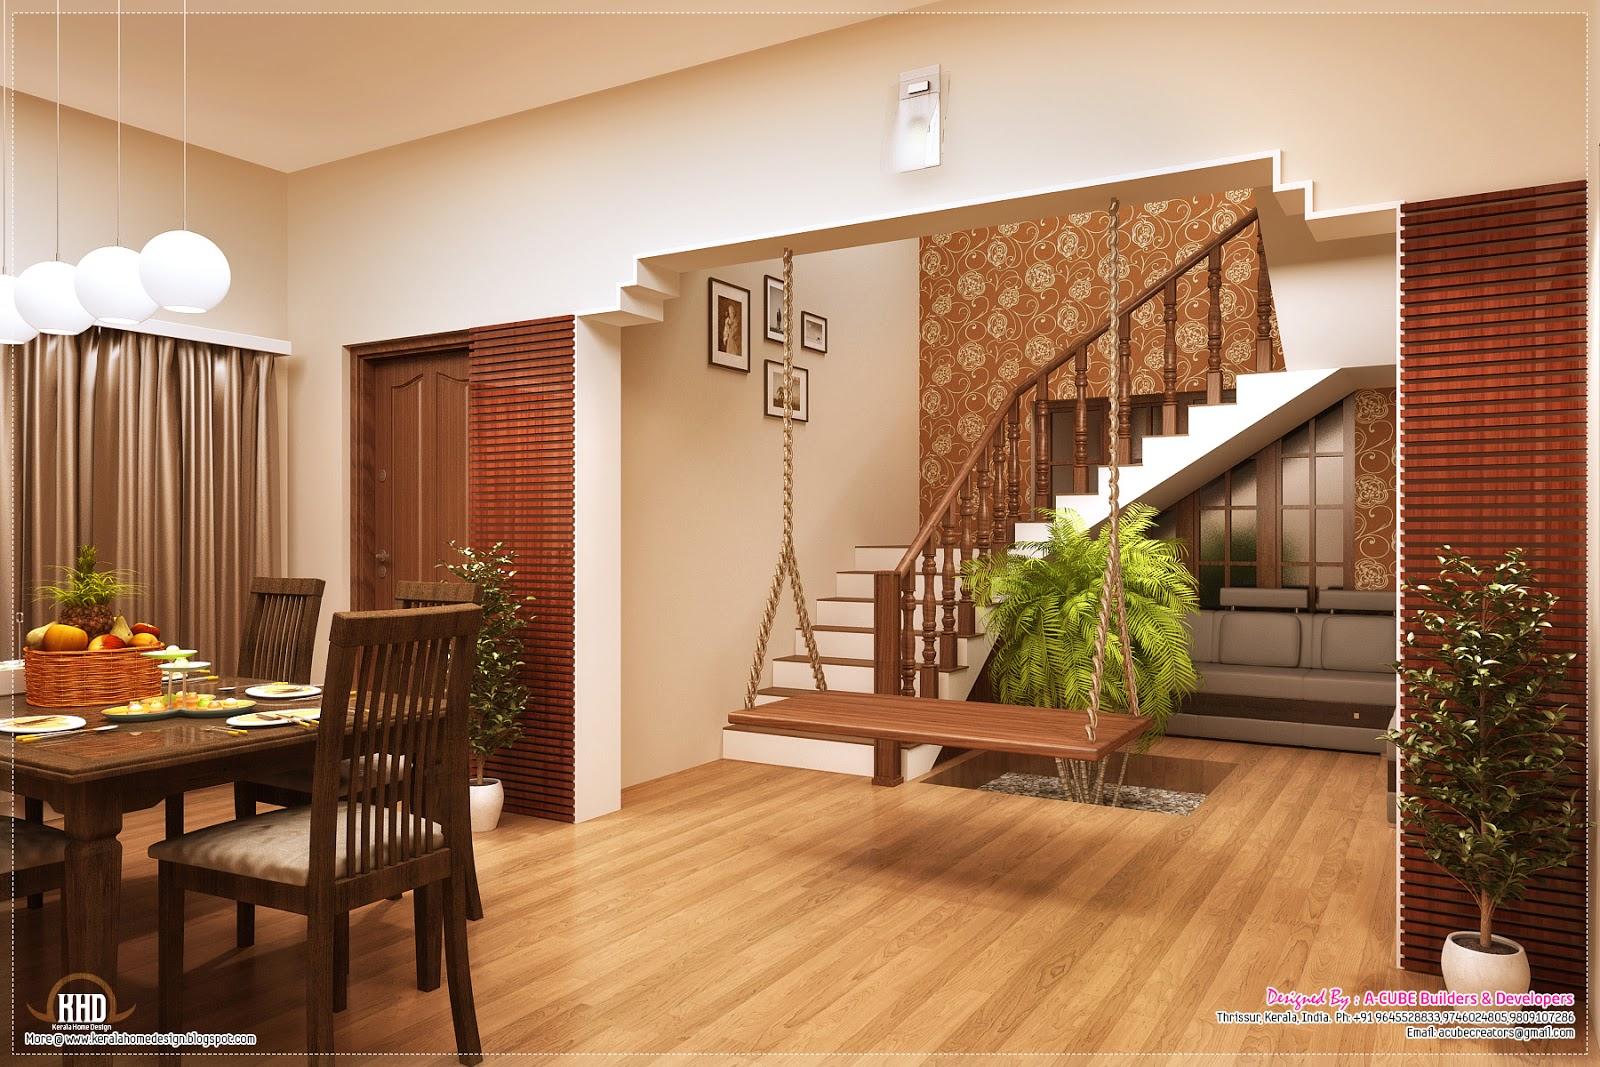 Kerala Home Interior Designs Pooja Room Design In Home Temple